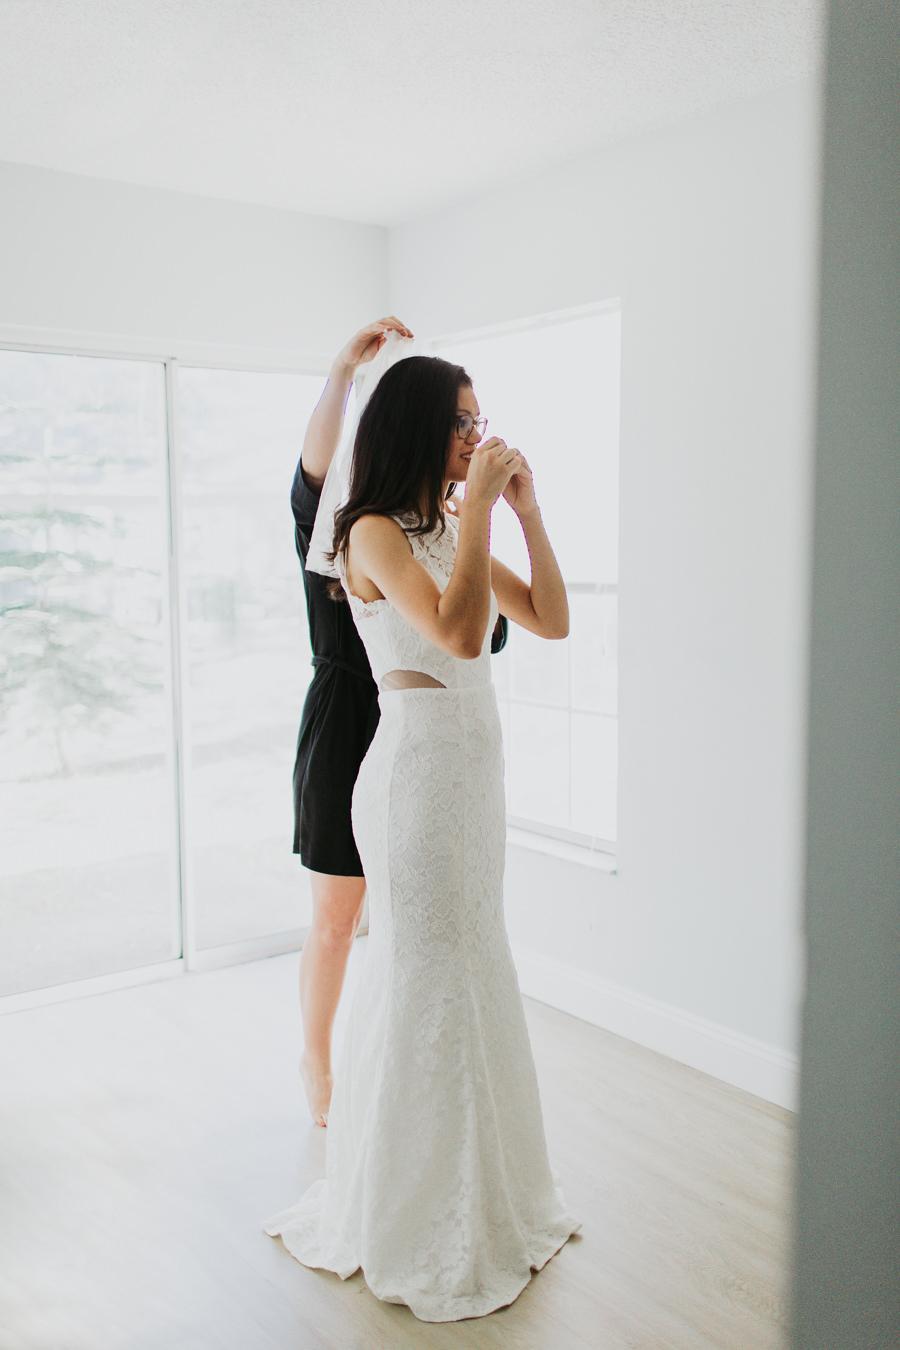 Tampa Heights Industrial Wedding at Cavu Emmy RJ-10.jpg